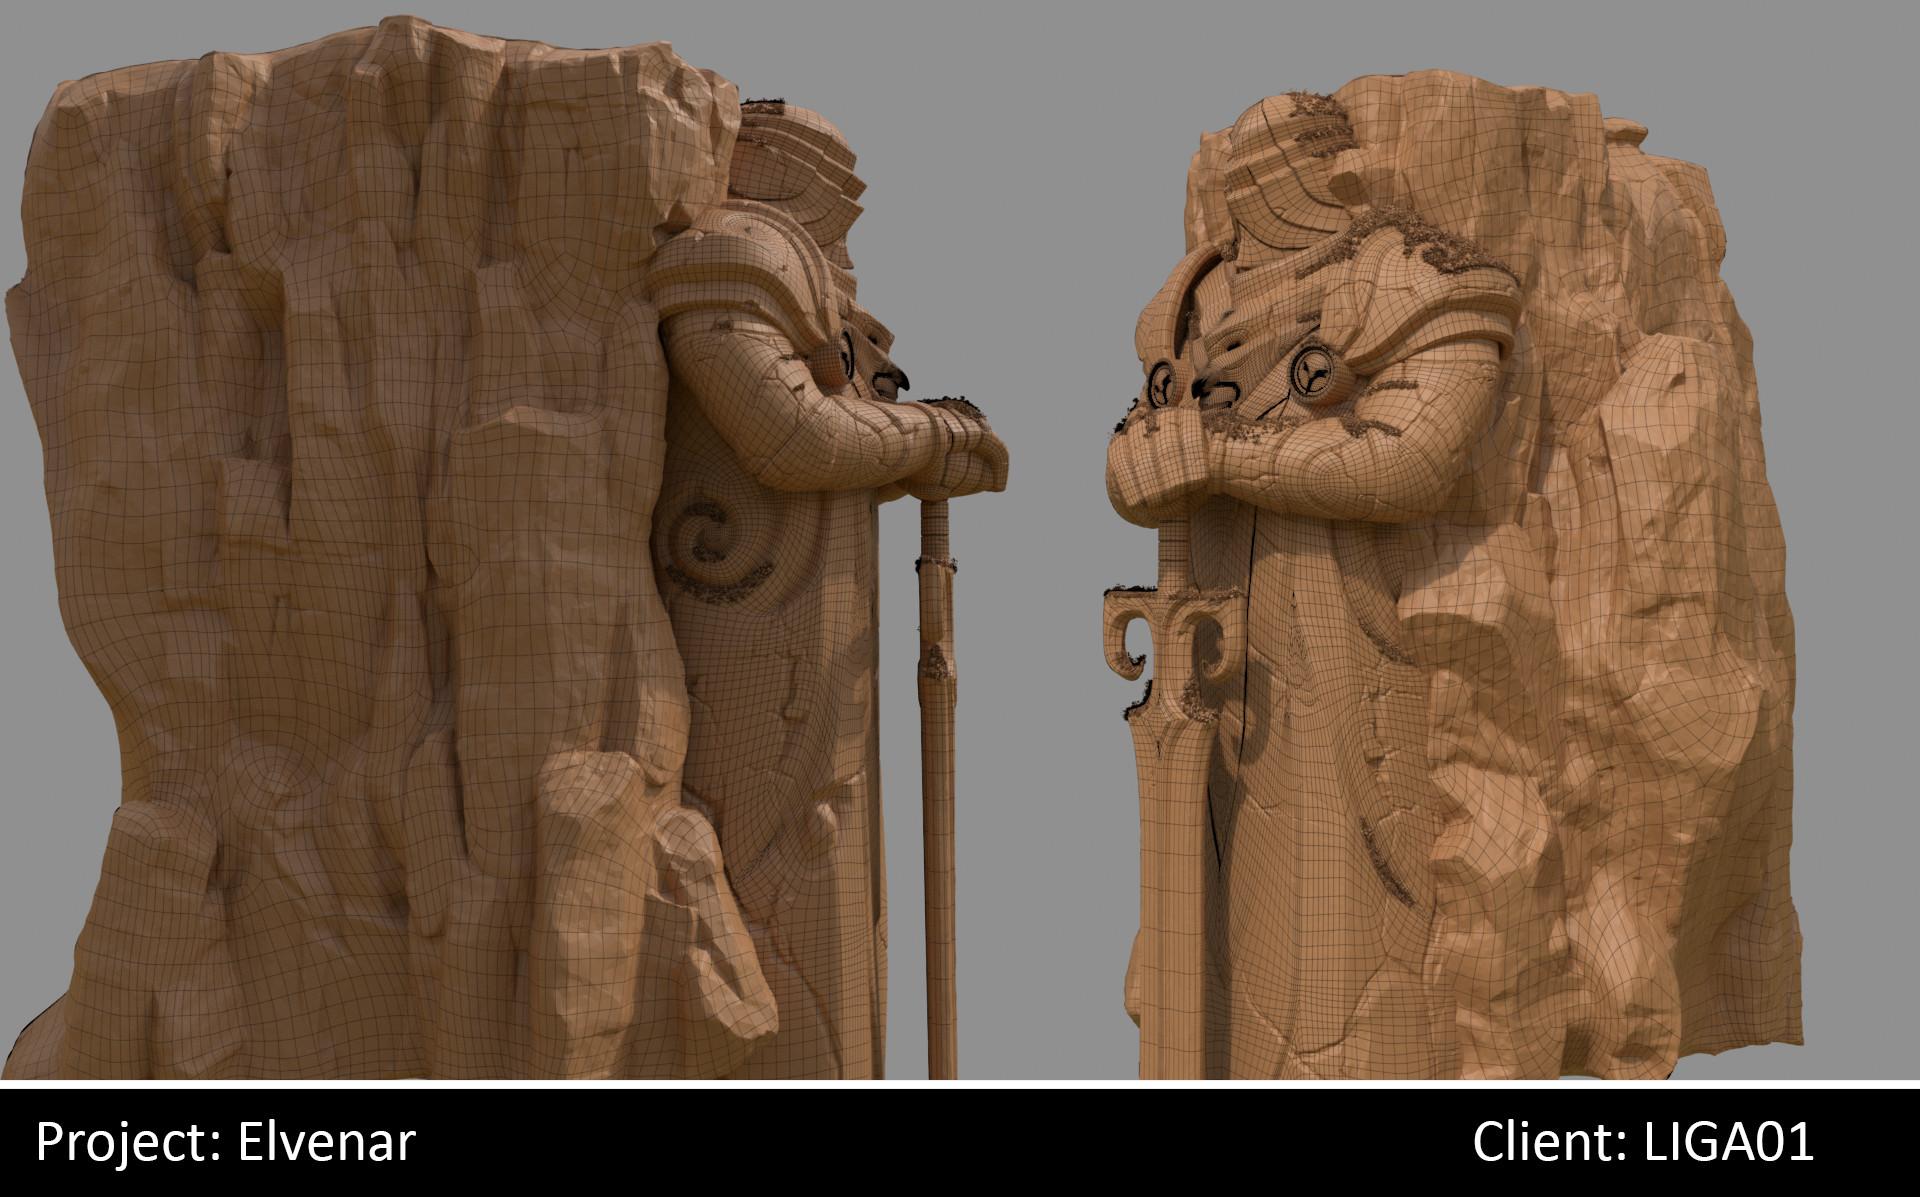 Darko mitev statue02 wireframe